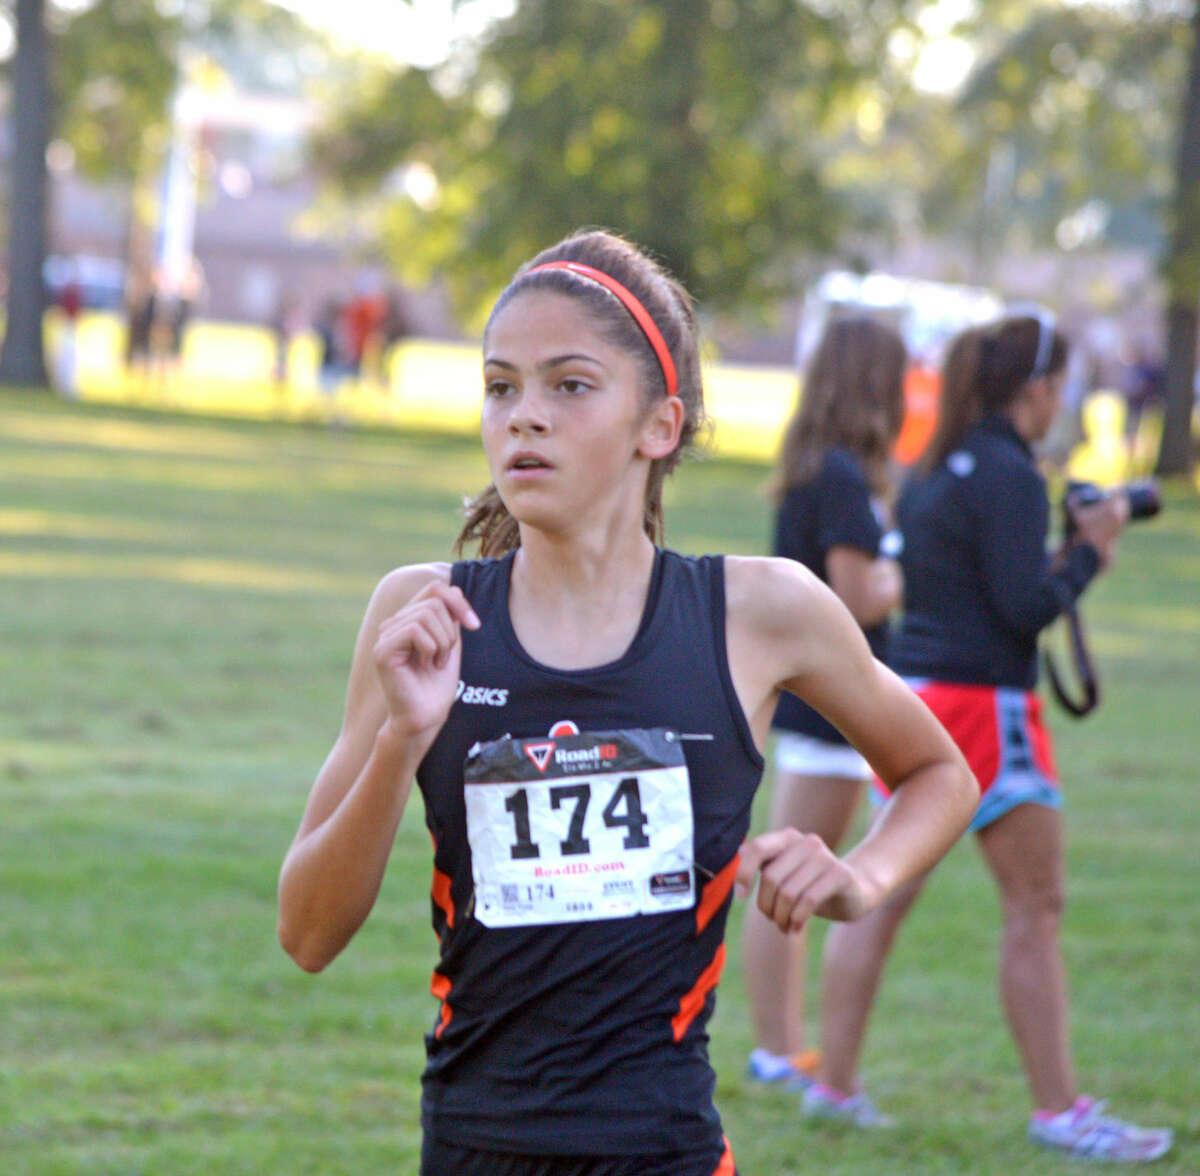 Edwardsville freshman Abby Korak runs on Saturday in the girls' varsity race at the Granite City Invitational.